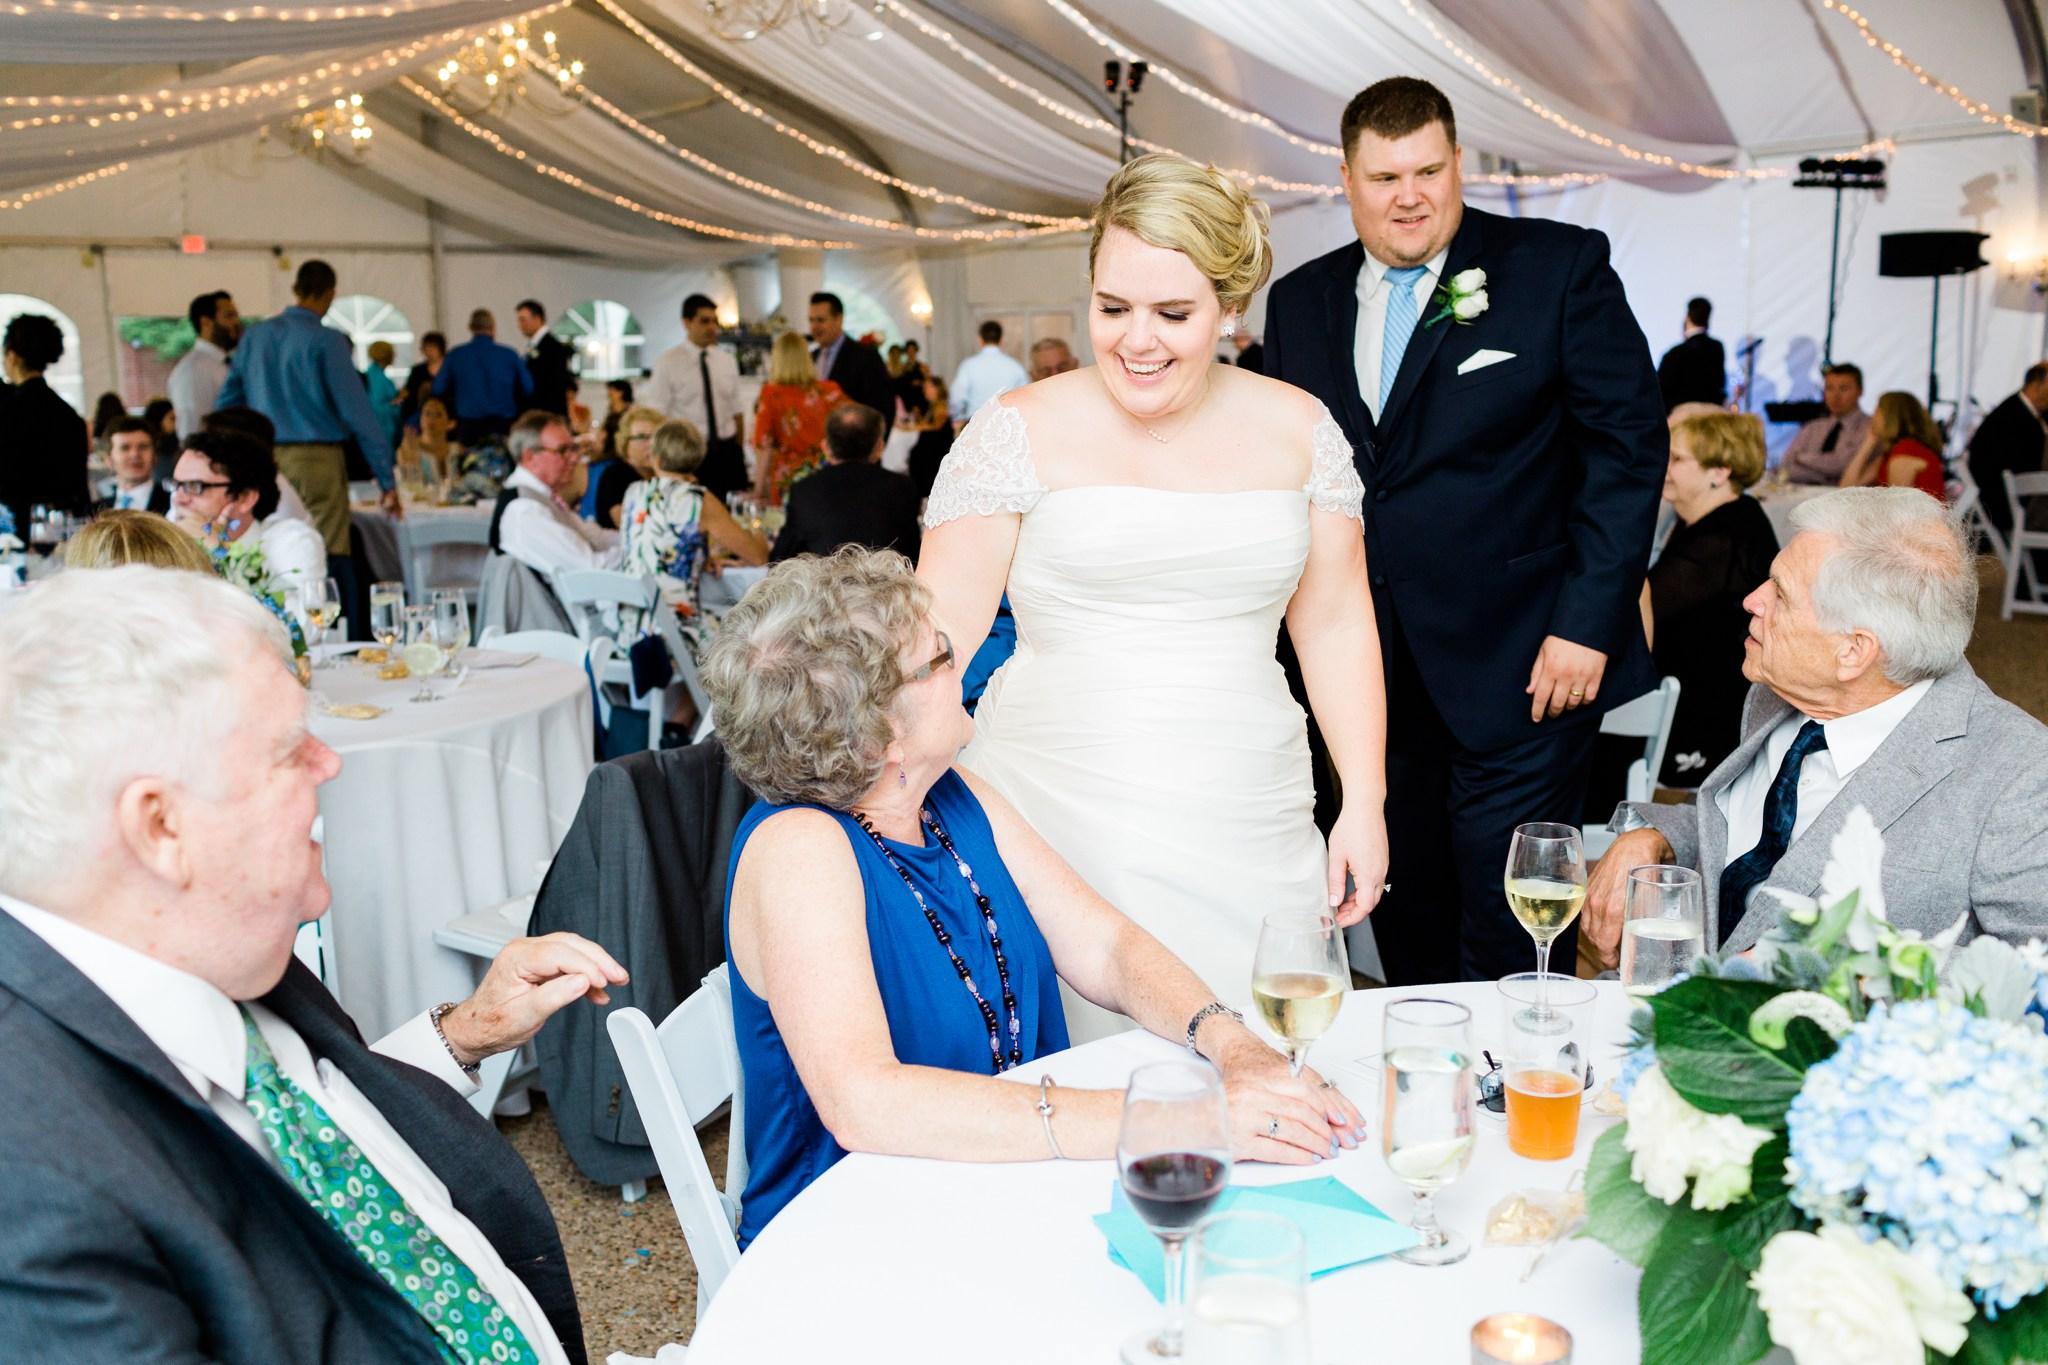 misselwood_endicott_college_wedding_photos_00068.JPG